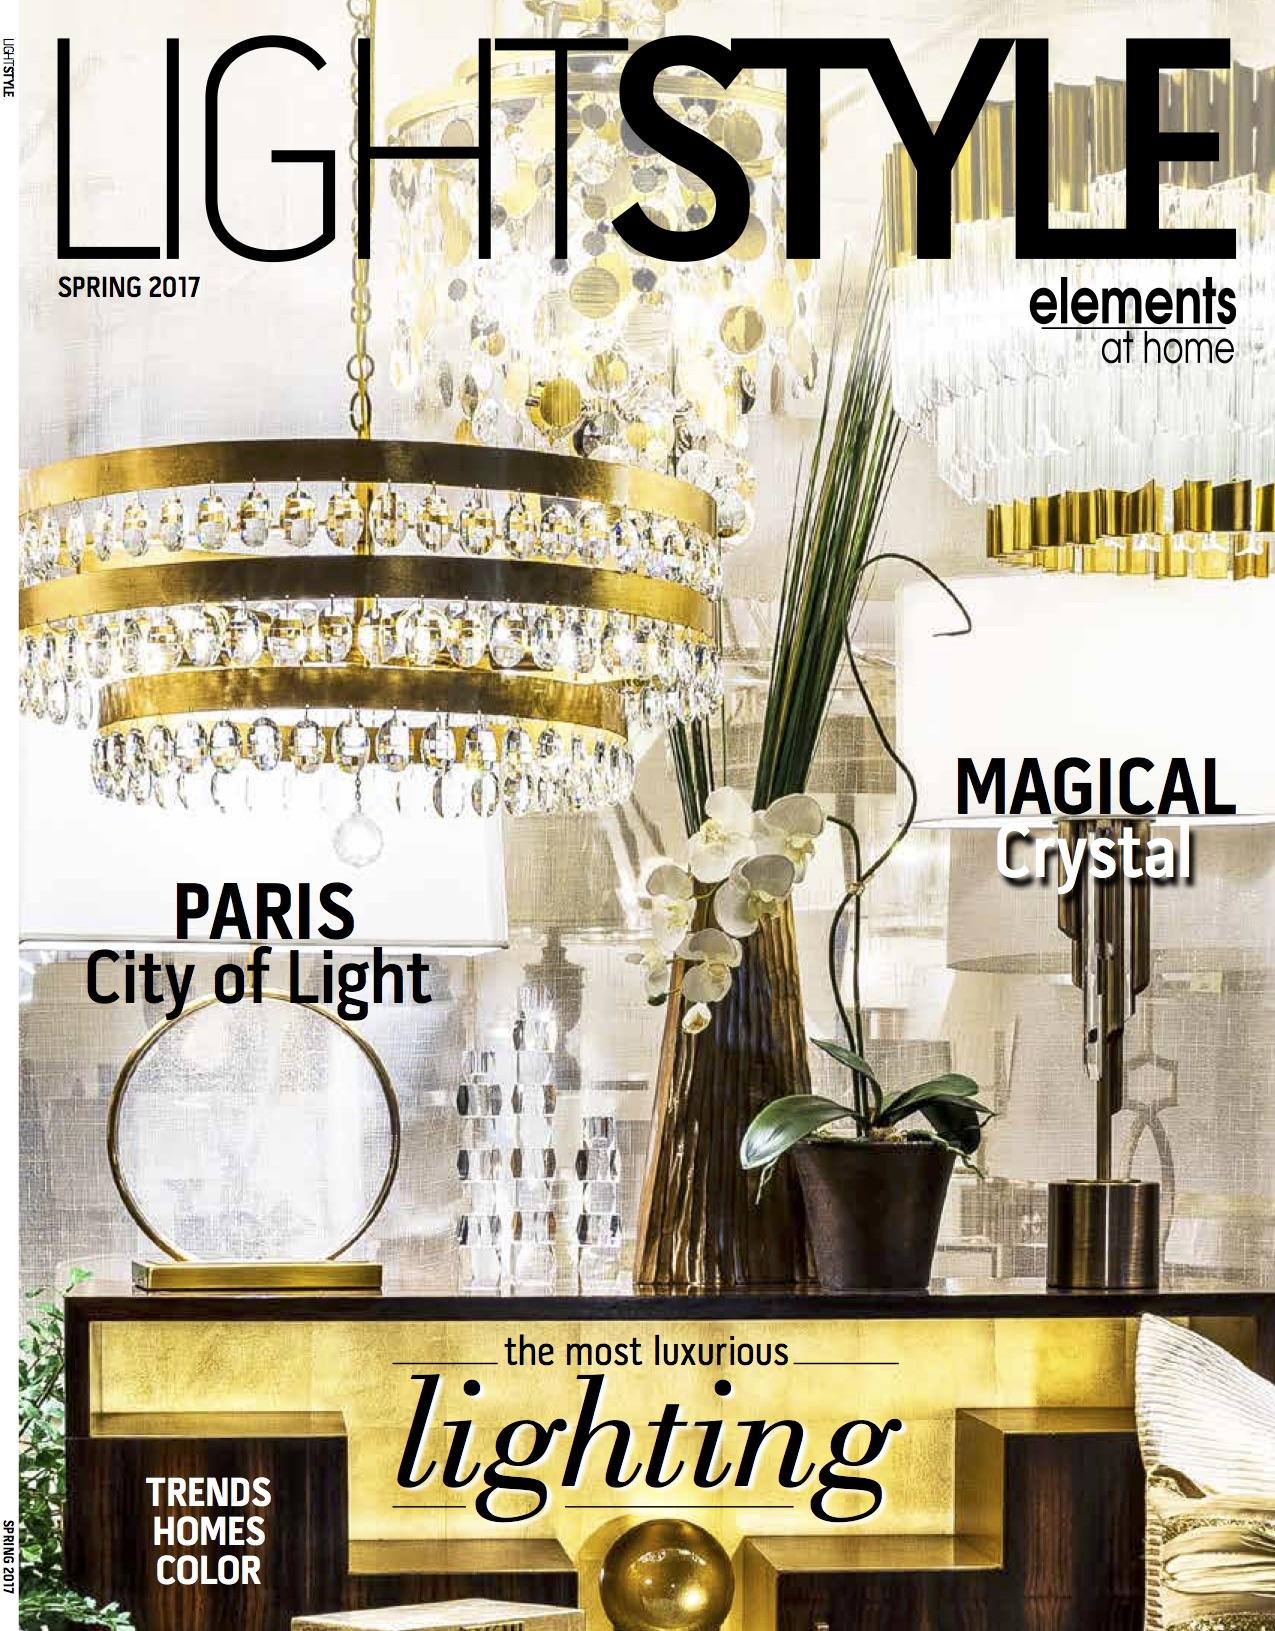 Decor Aid Featured Lightstyle Magazine